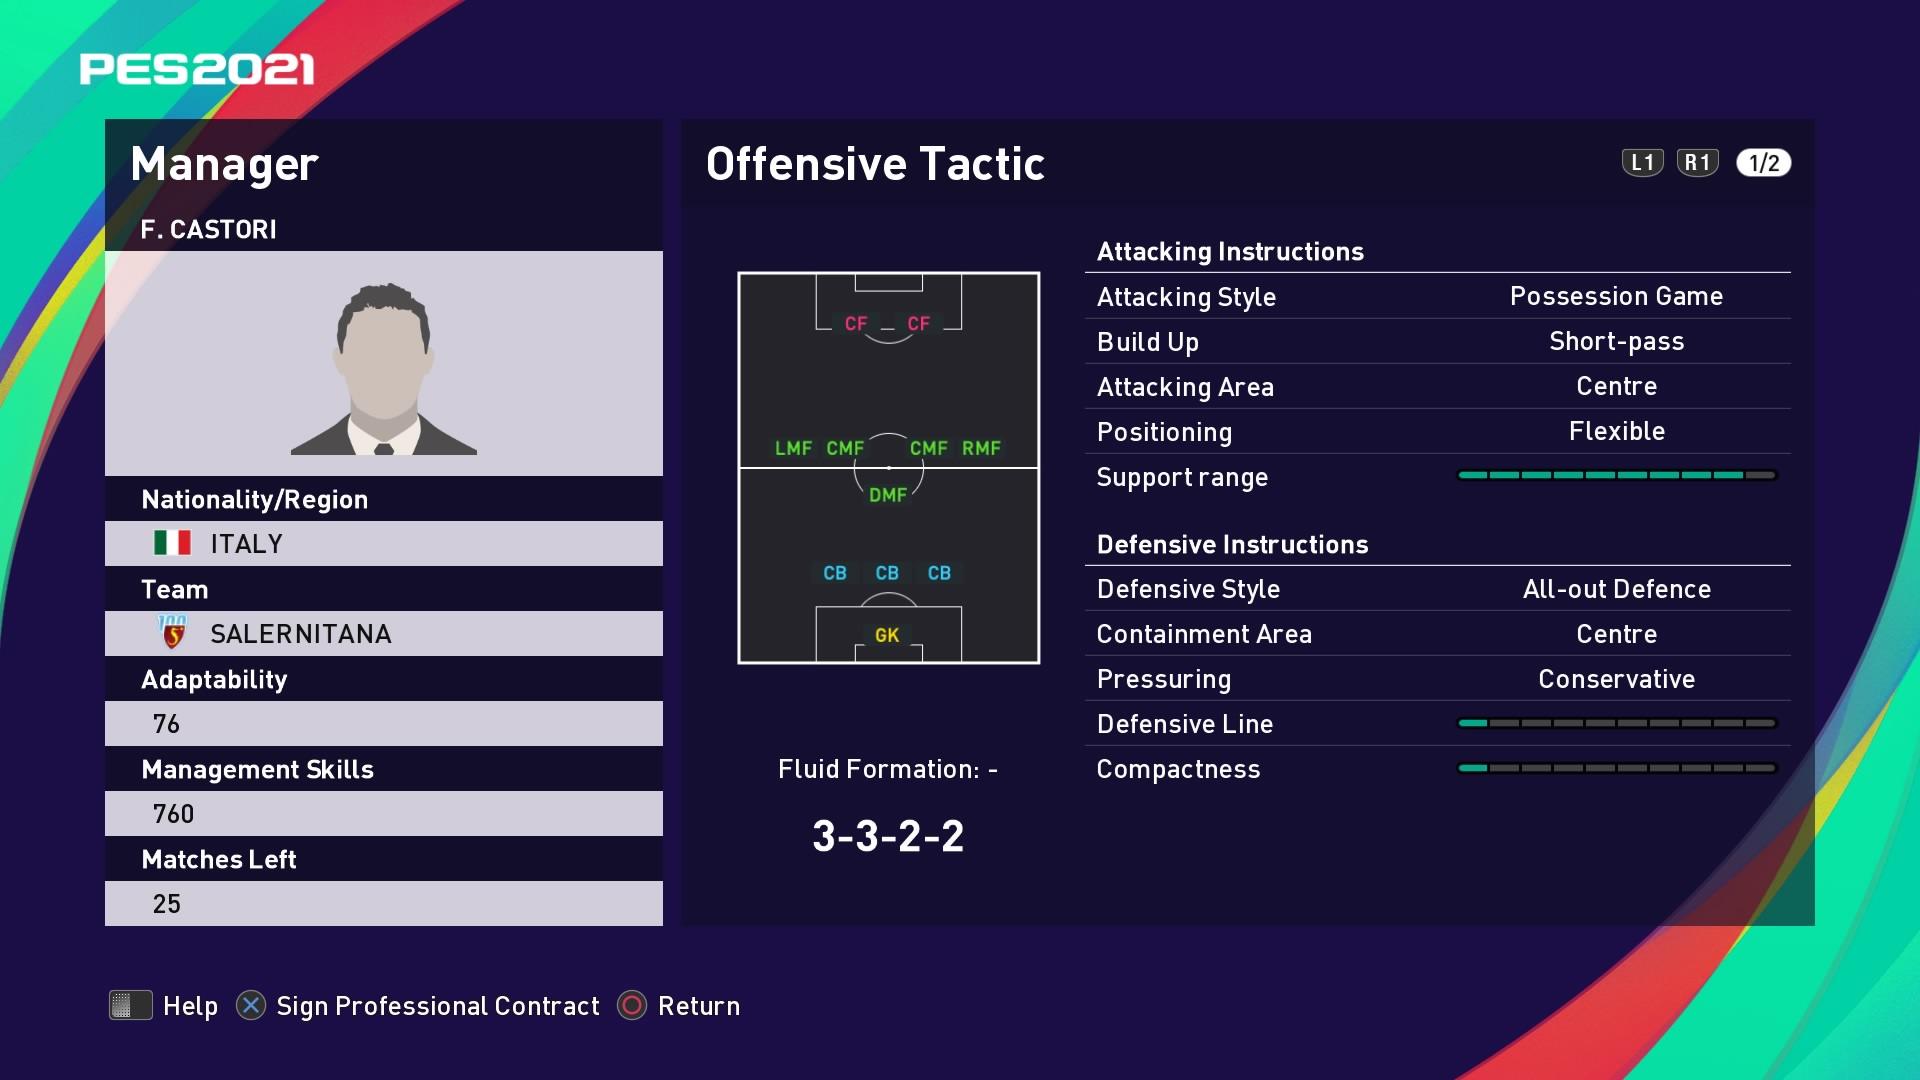 F. Castori (Fabrizio Castori) Offensive Tactic in PES 2021 myClub